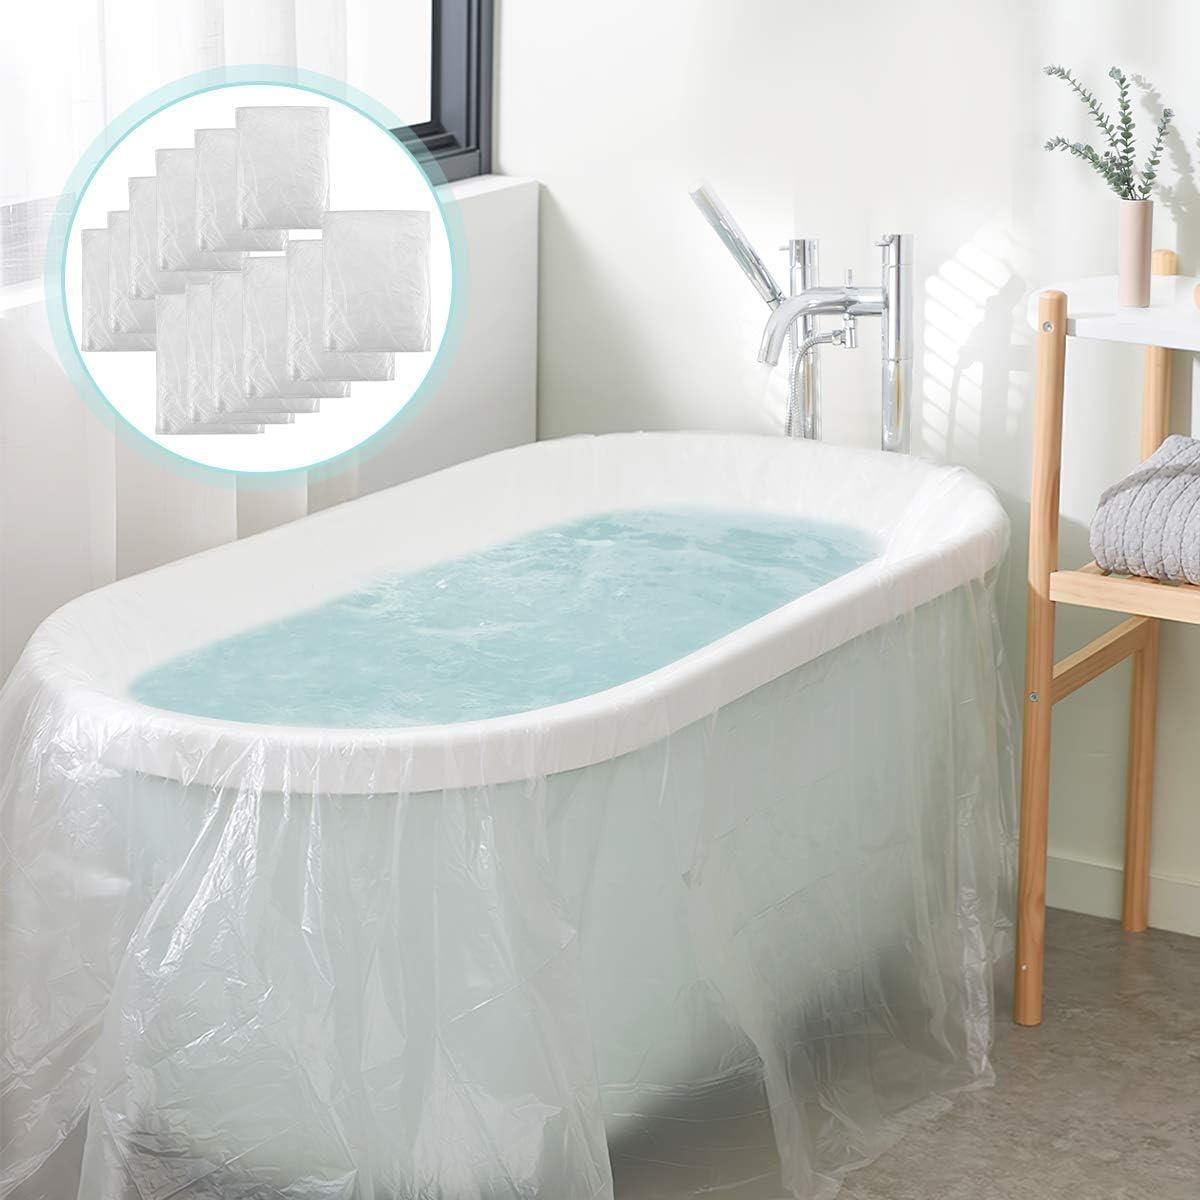 AGPTEK 12 Pack Disposable Bathtub Cover Liner, Large Bathtub Liner Plastic Bag for Salon, Household and Hotel Bath Tubs (102 x47 Inch): Home & Kitchen